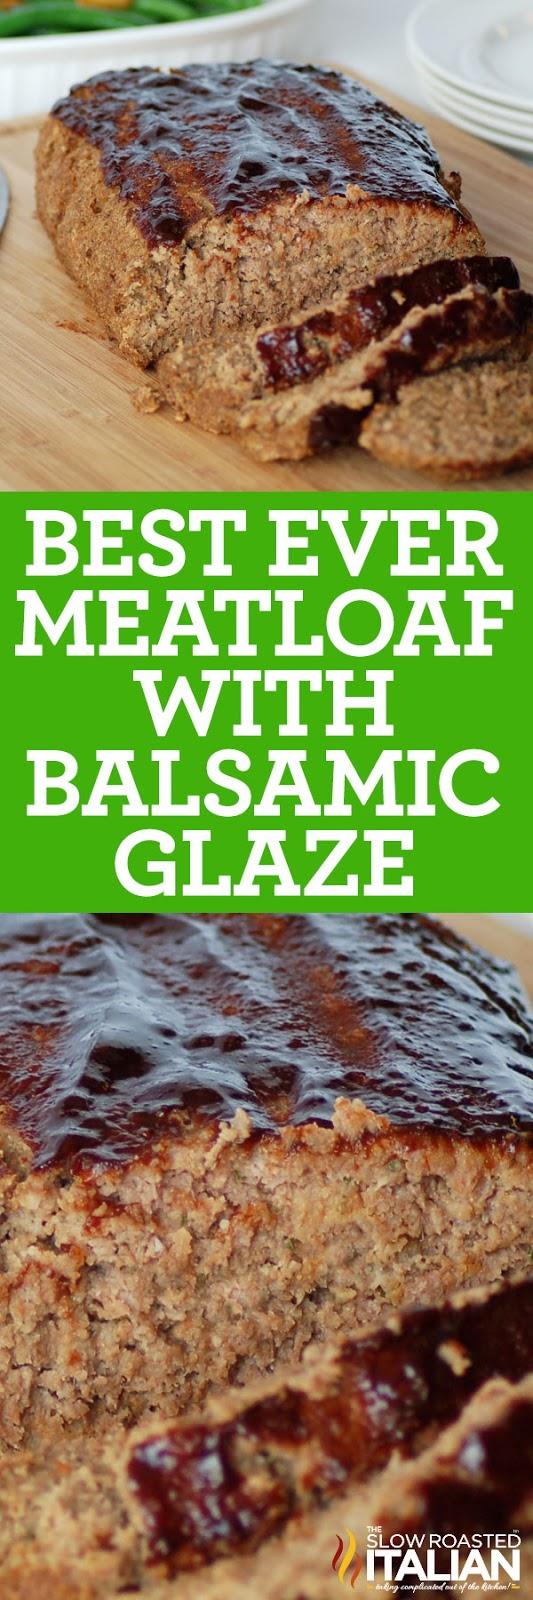 titled photo for Pinterest: Best Meatloaf Ever with Balsamic Glaze